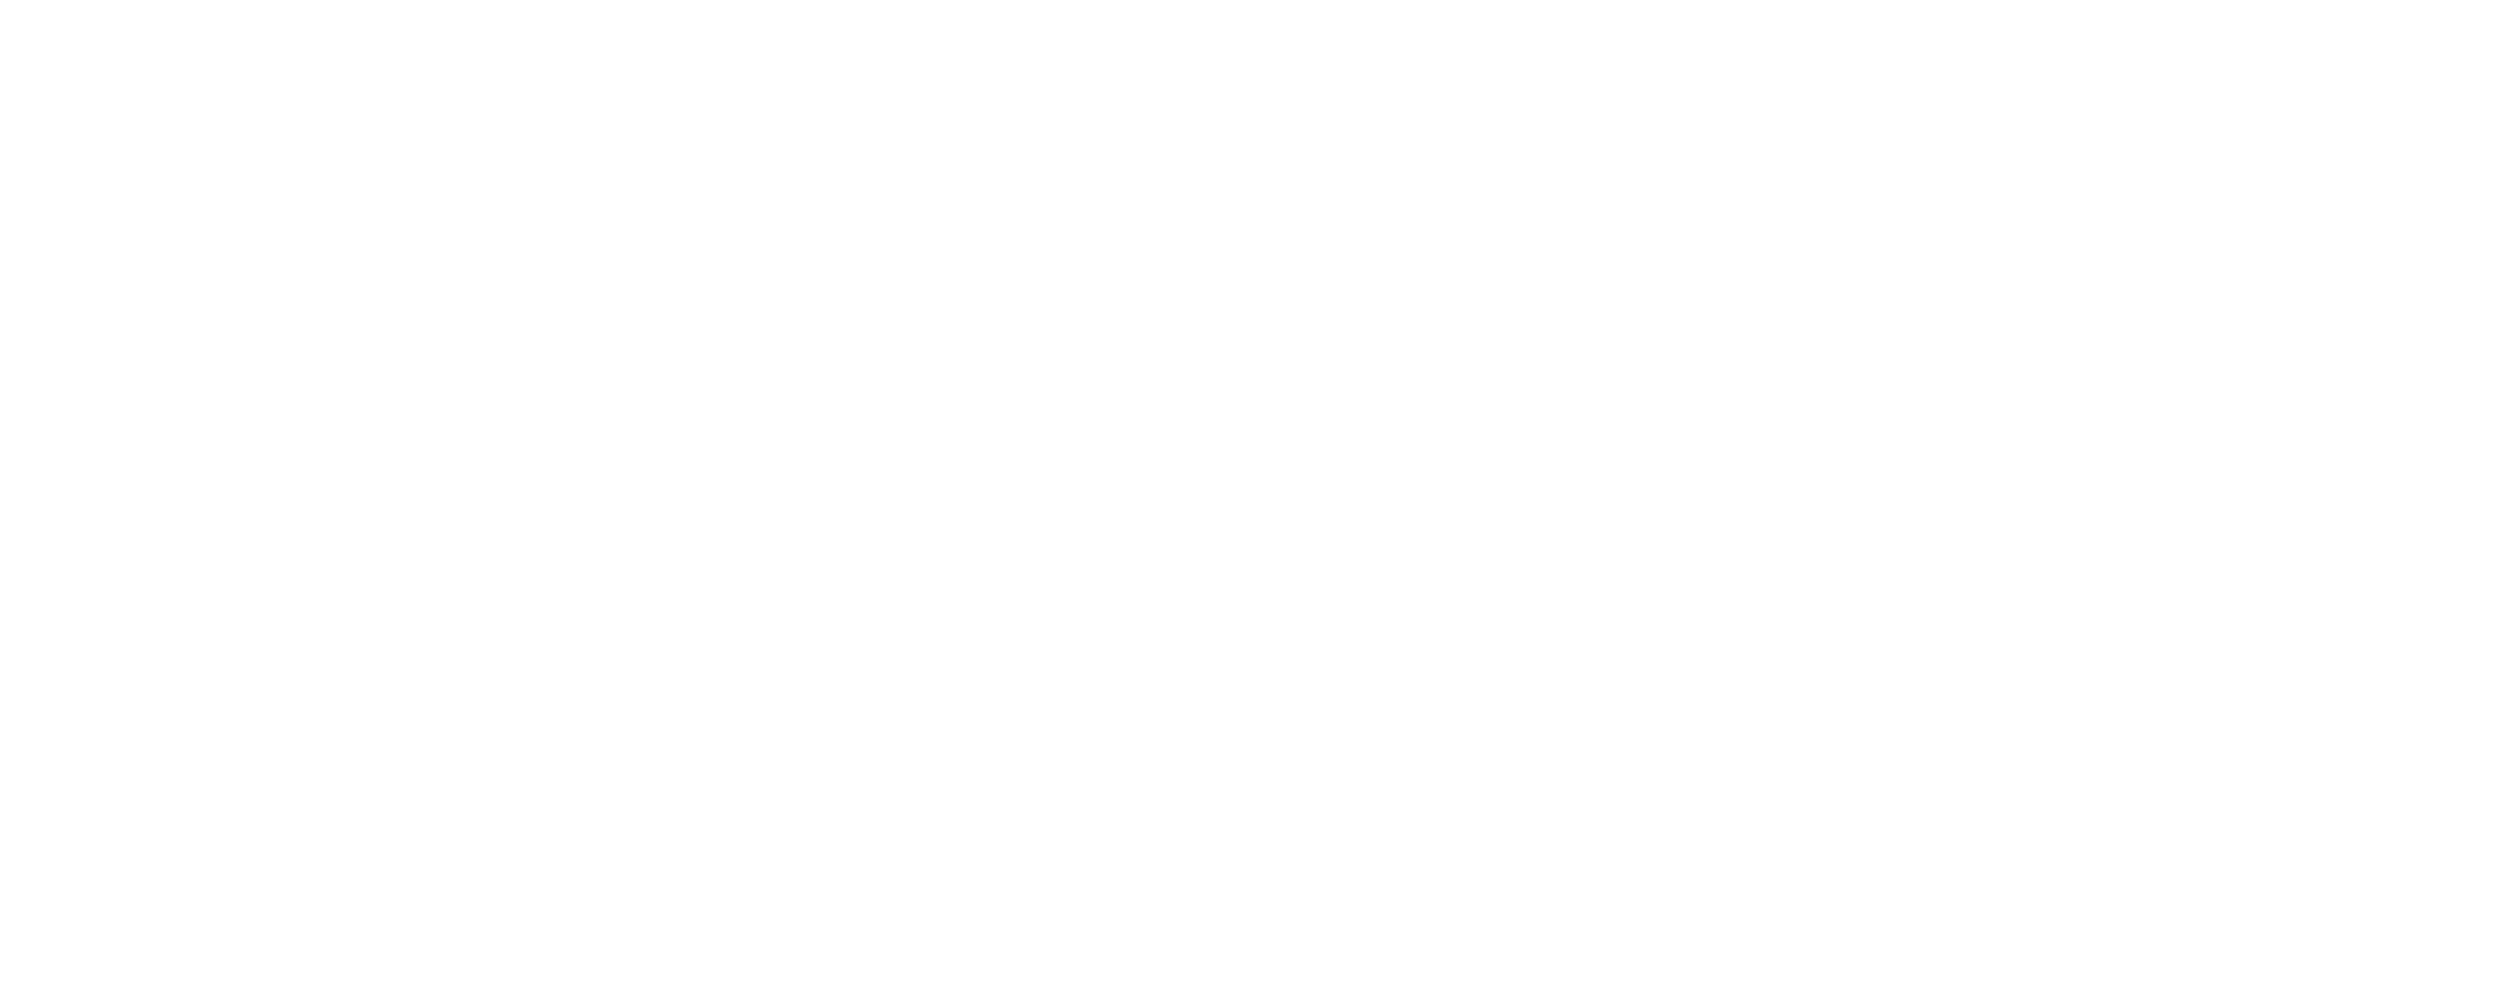 Curricula Logo